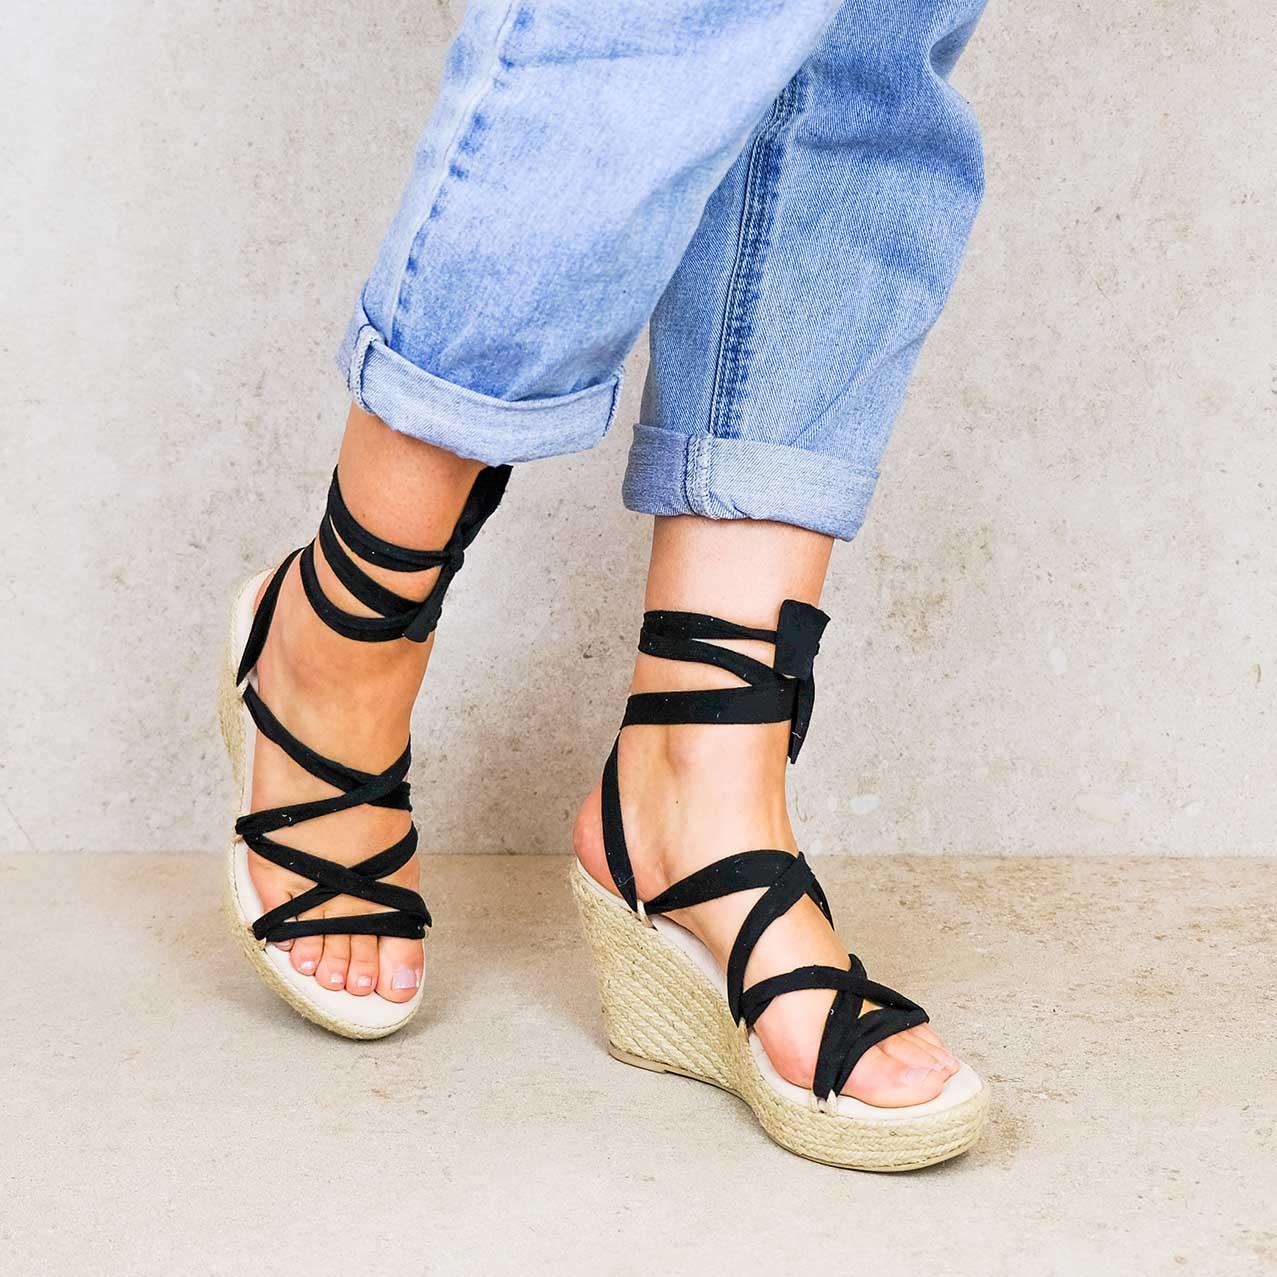 Chilon-jute_lintsandalen sandals travelsandals vegan sustainable sandals wikkelsandalen